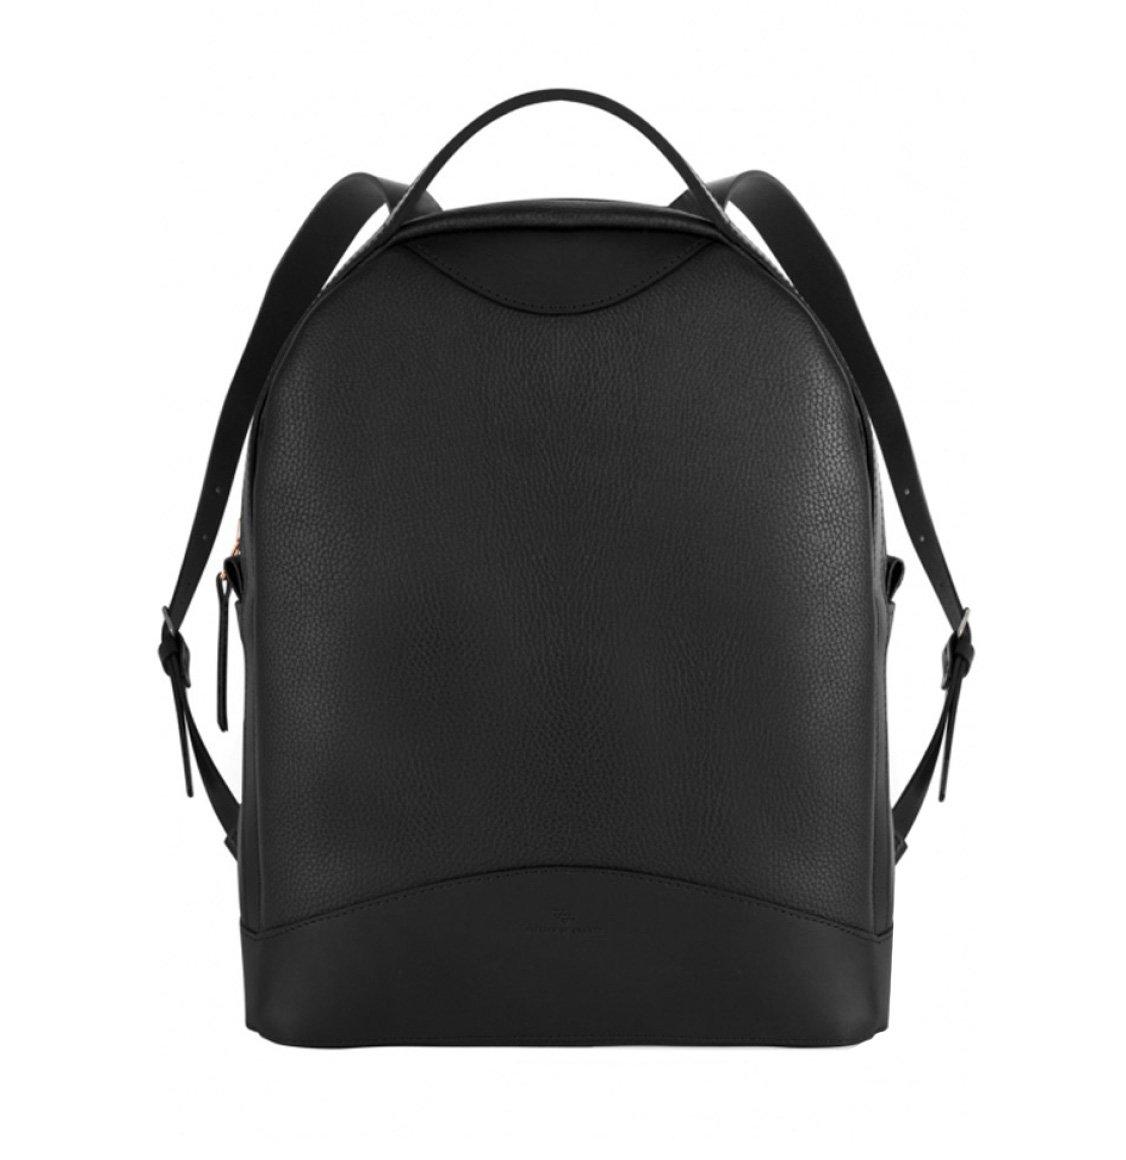 Atelier De L' Armee Black Leather Luxury Backpack